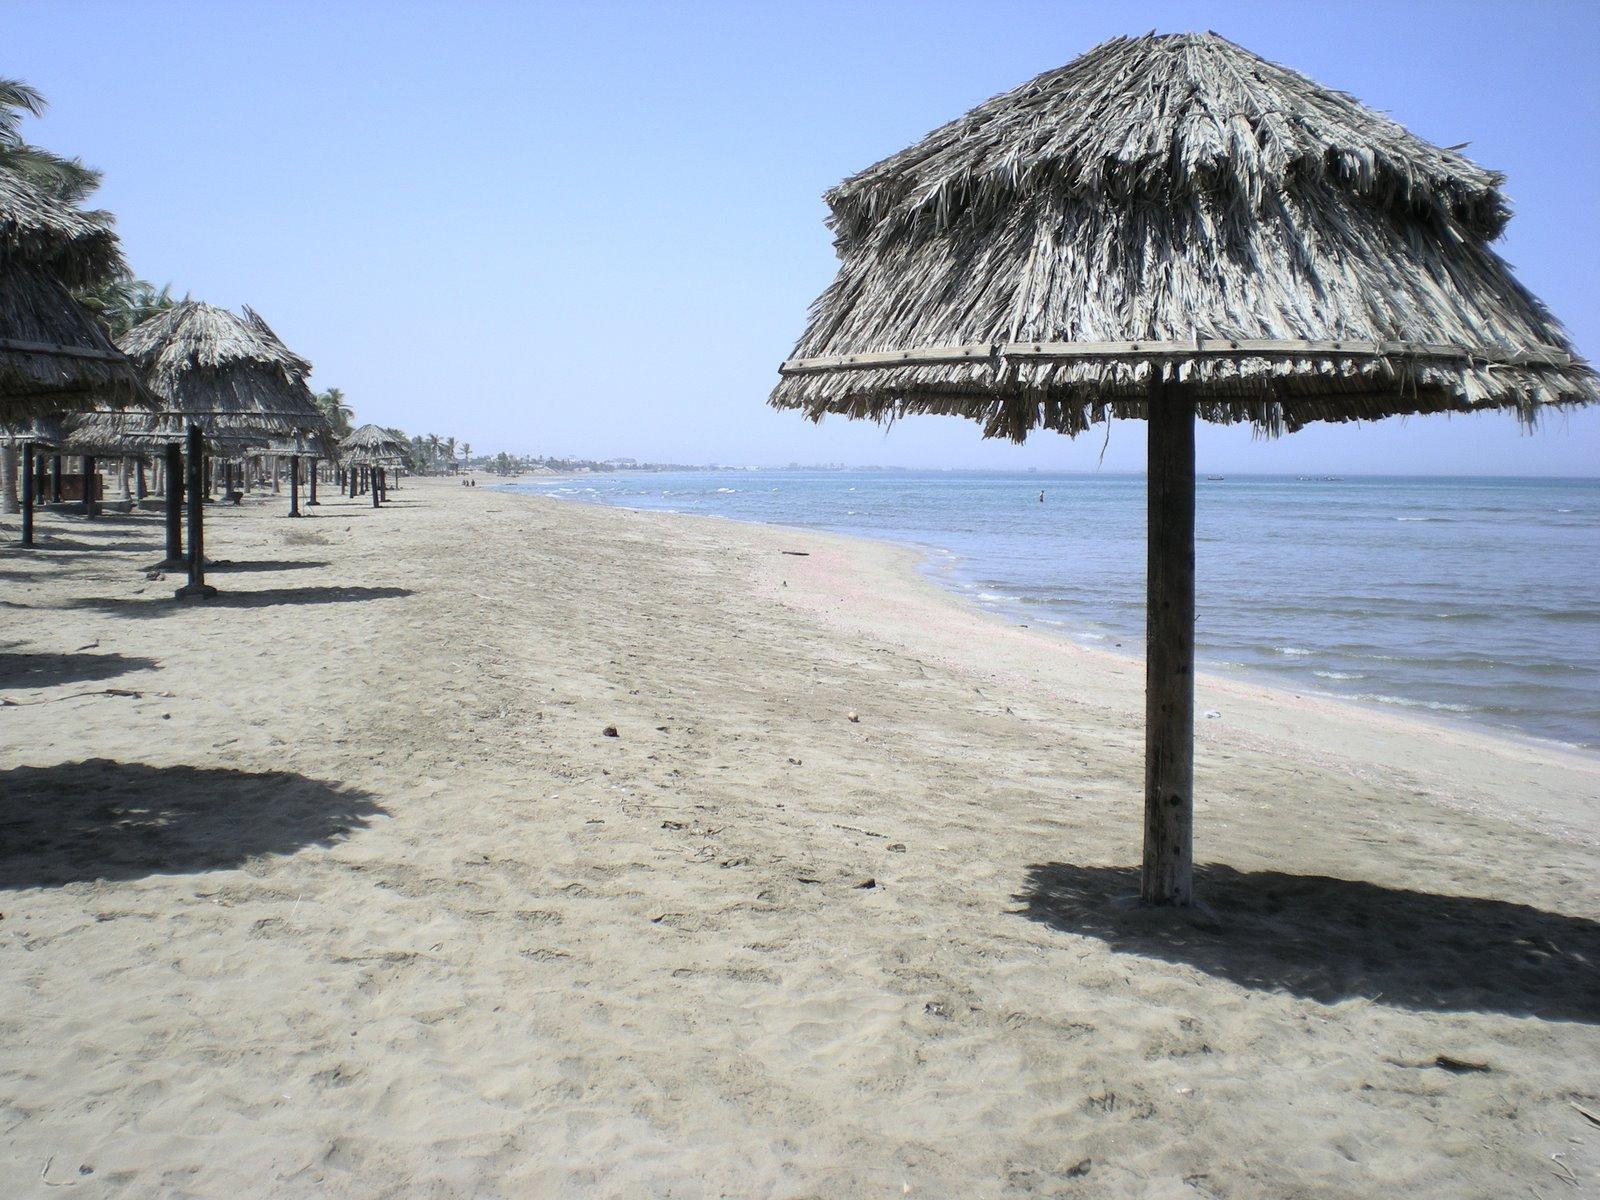 Qurum Beach Muscat Oman Stock Photo - Image: 51679399